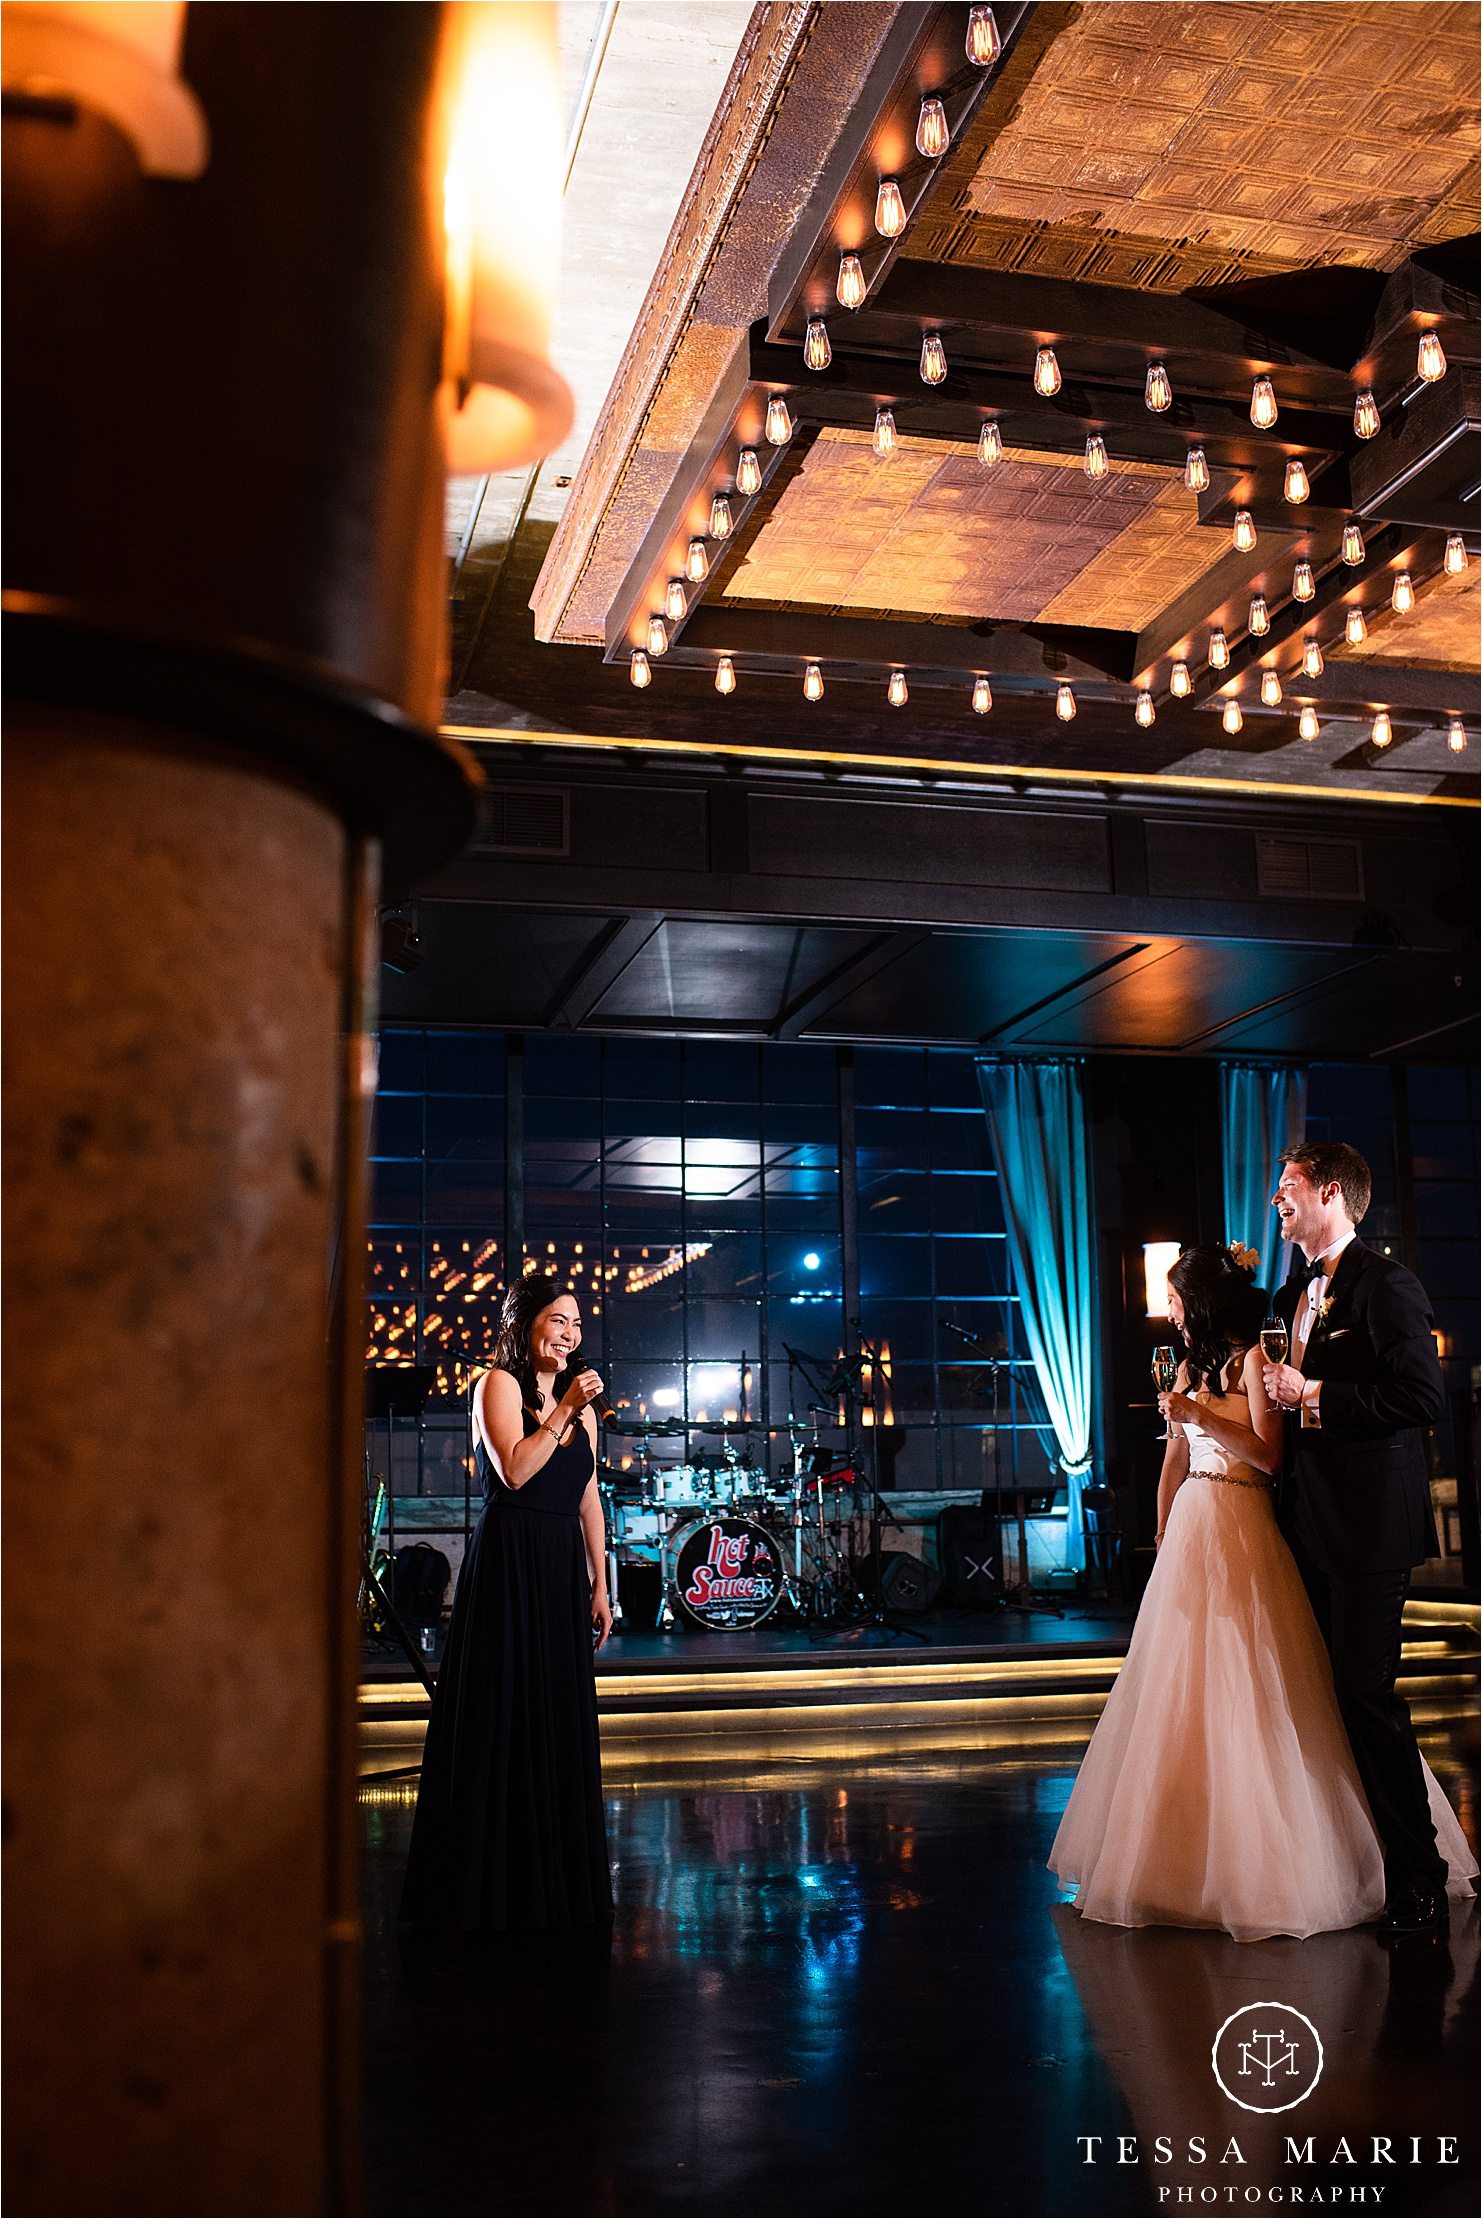 Tessa_marie_weddings_houston_wedding_photographer_The_astorian_0156.jpg